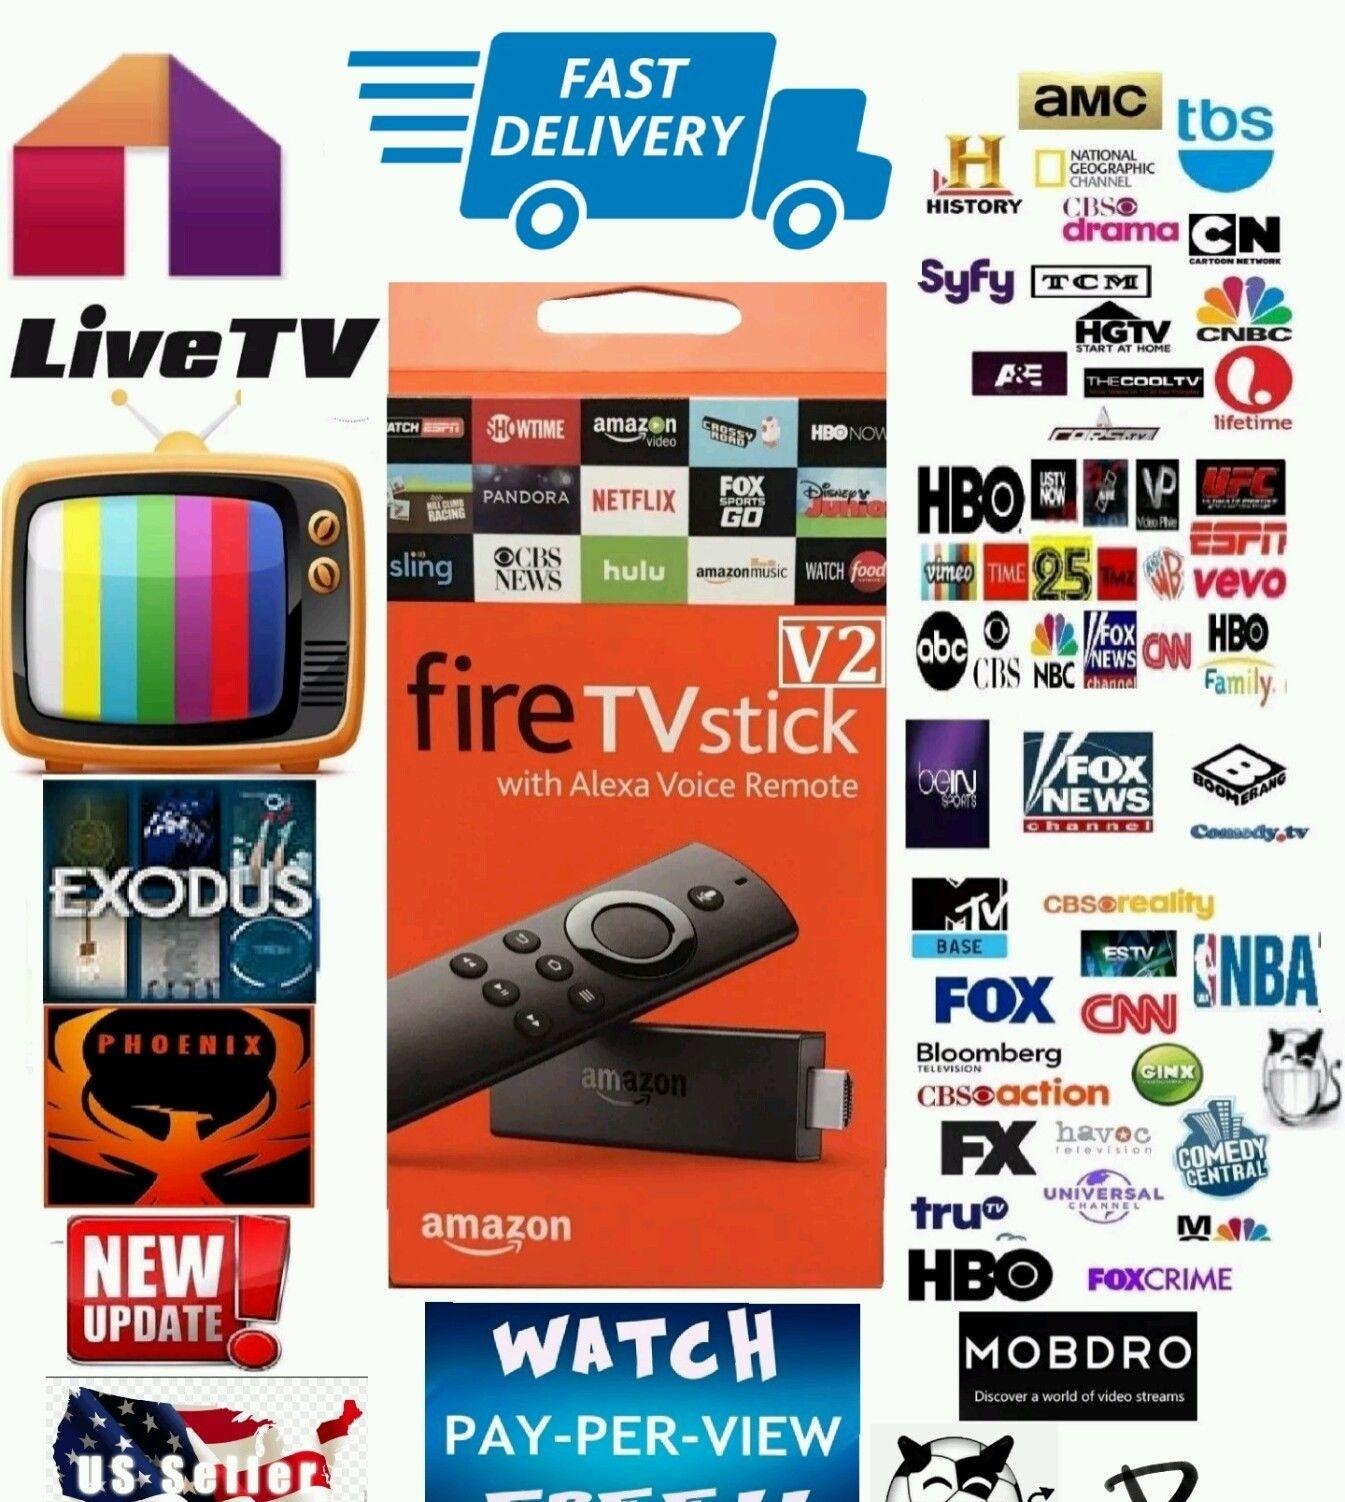 Amazon Fire Stick With Alexa Voice Jailbroke and 50 similar